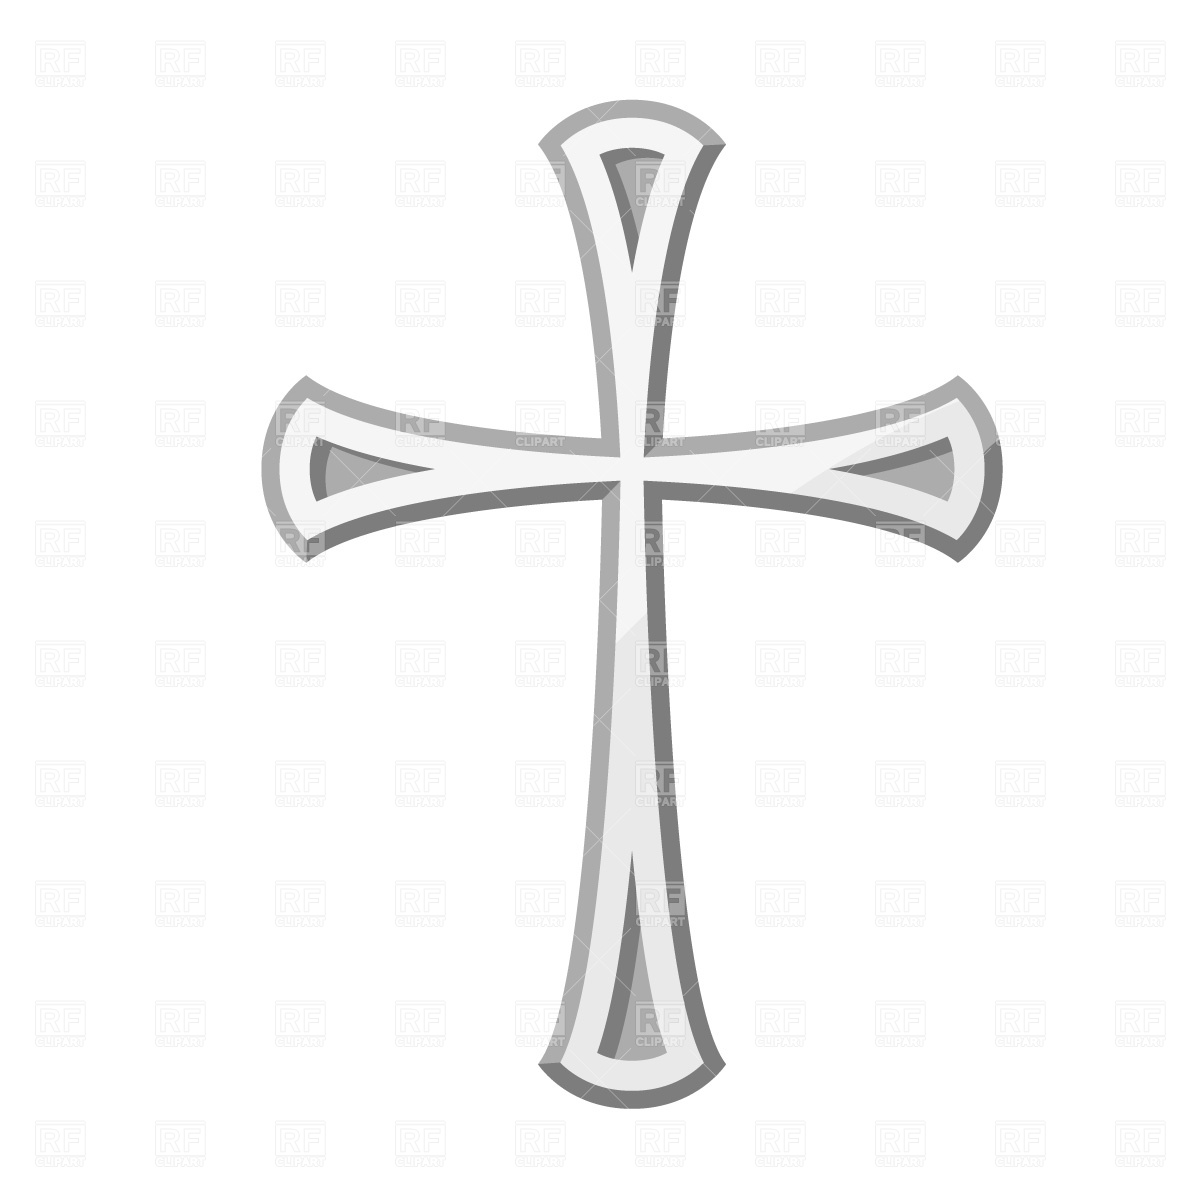 Cross 557 Signs Symbols Maps Download Fr-Cross 557 Signs Symbols Maps Download Free Vector Clipart Eps-2